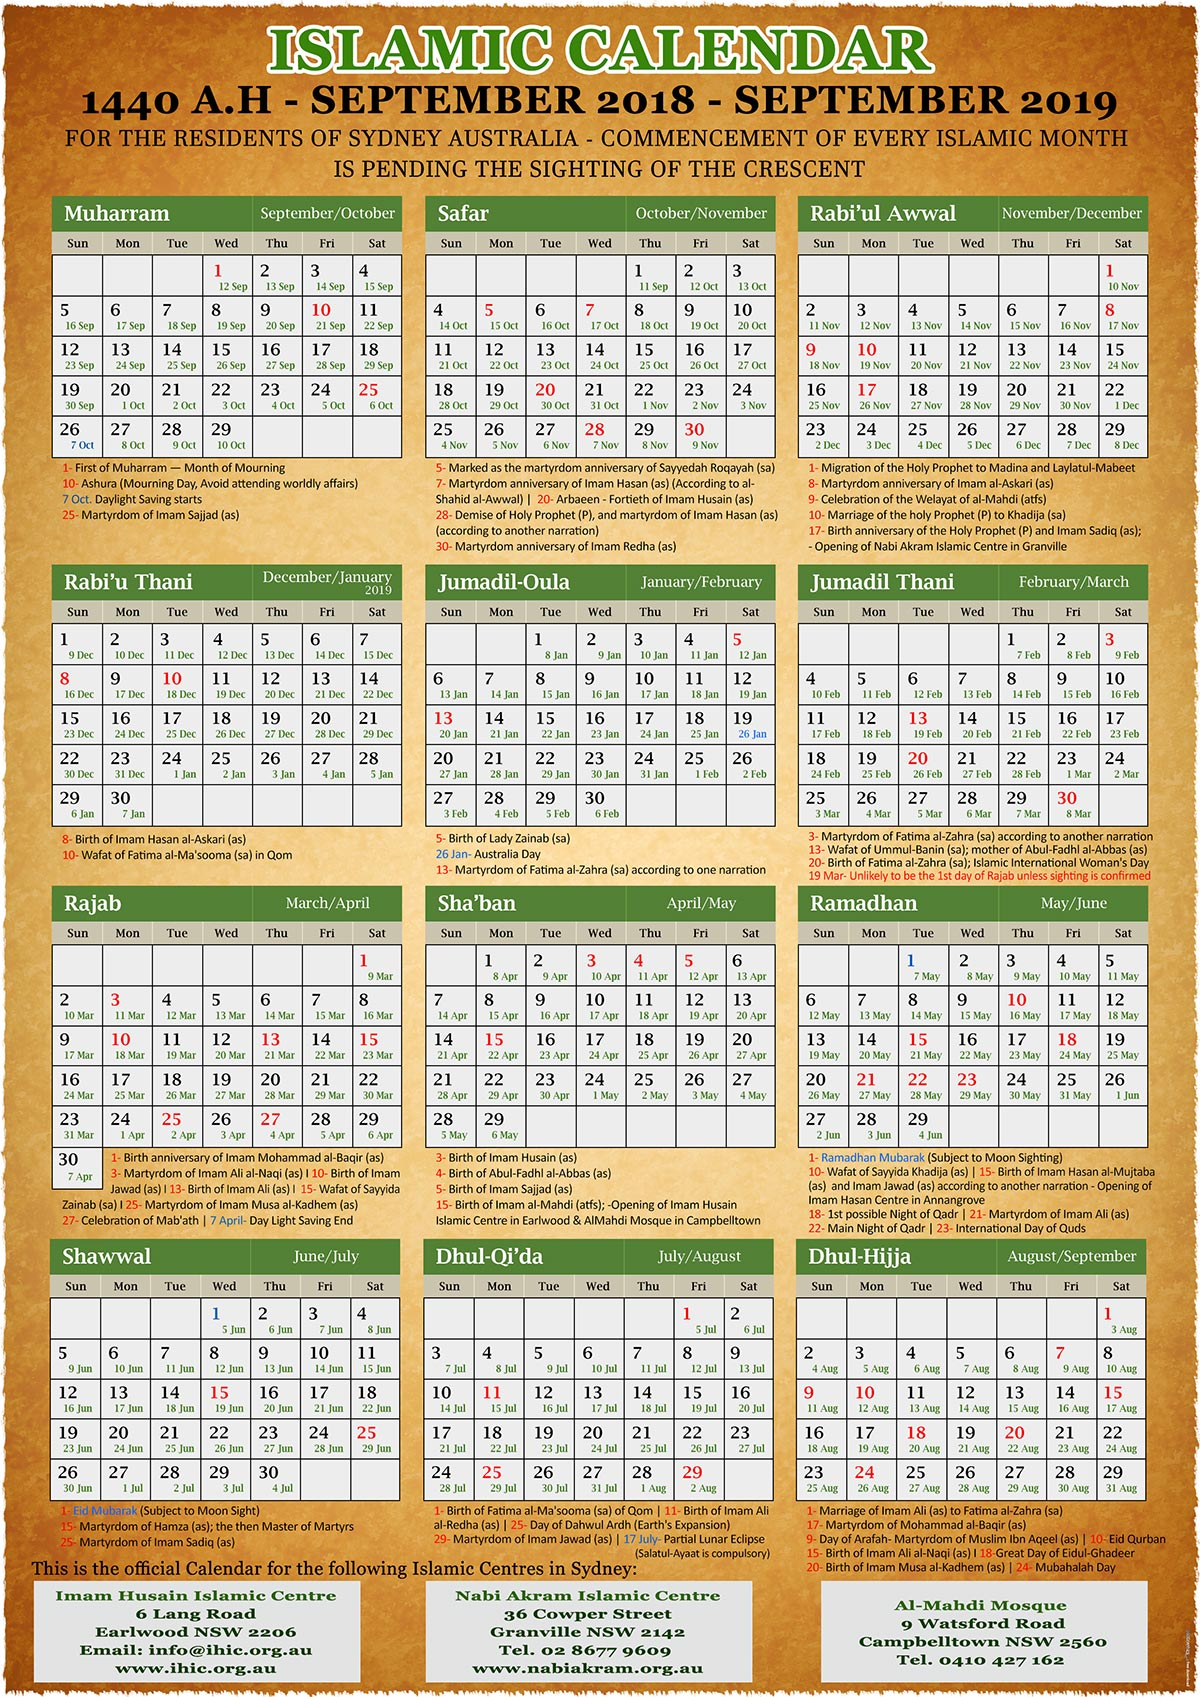 Islamic Calendar For 2019 Annual Islamic Calendar 1440 A.H. (2019) – Imam Husain Islamic Centre